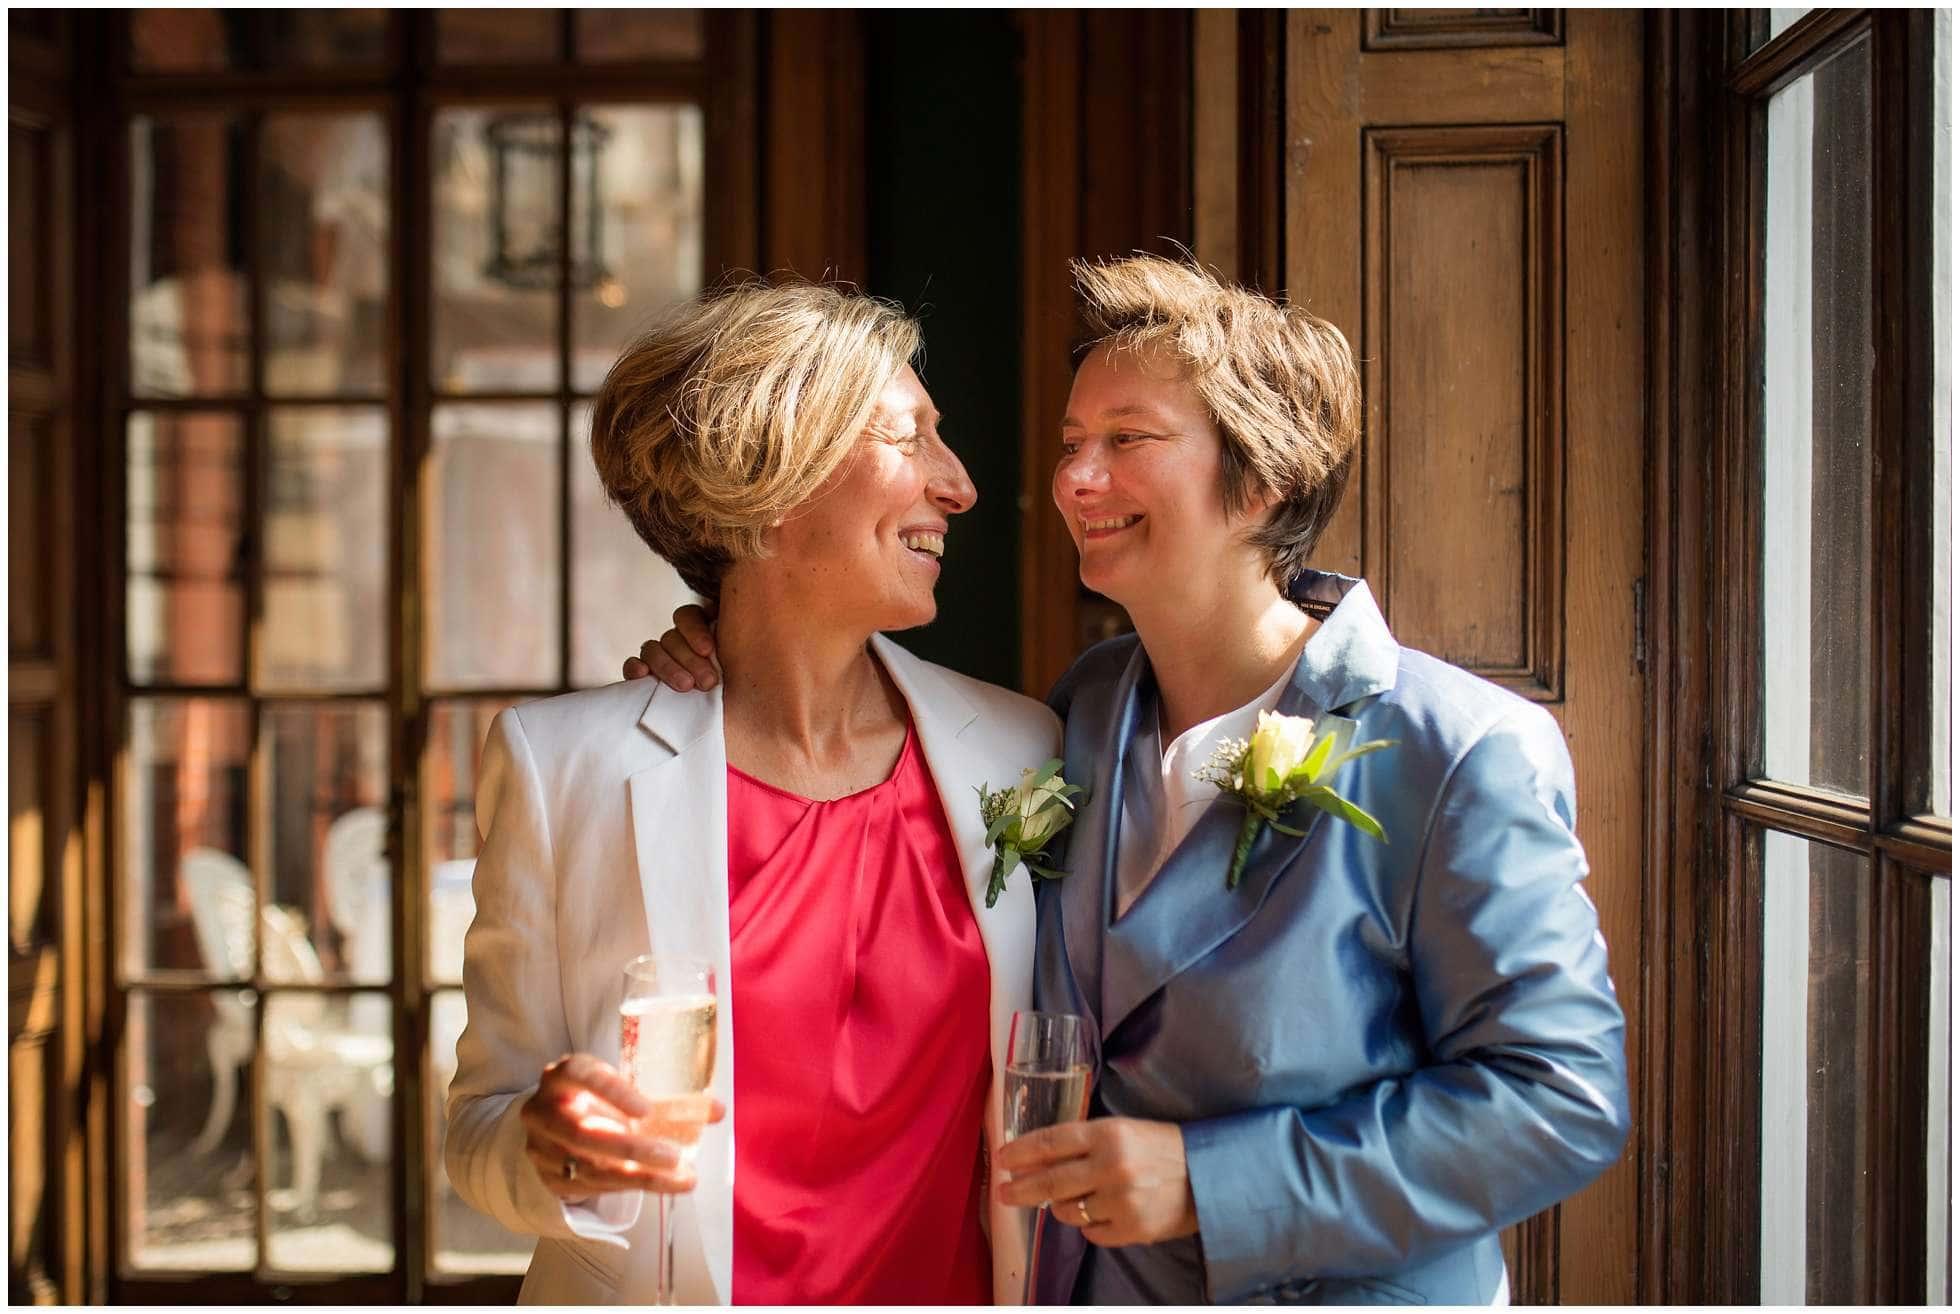 University Women's Club lovely lesbian wedding